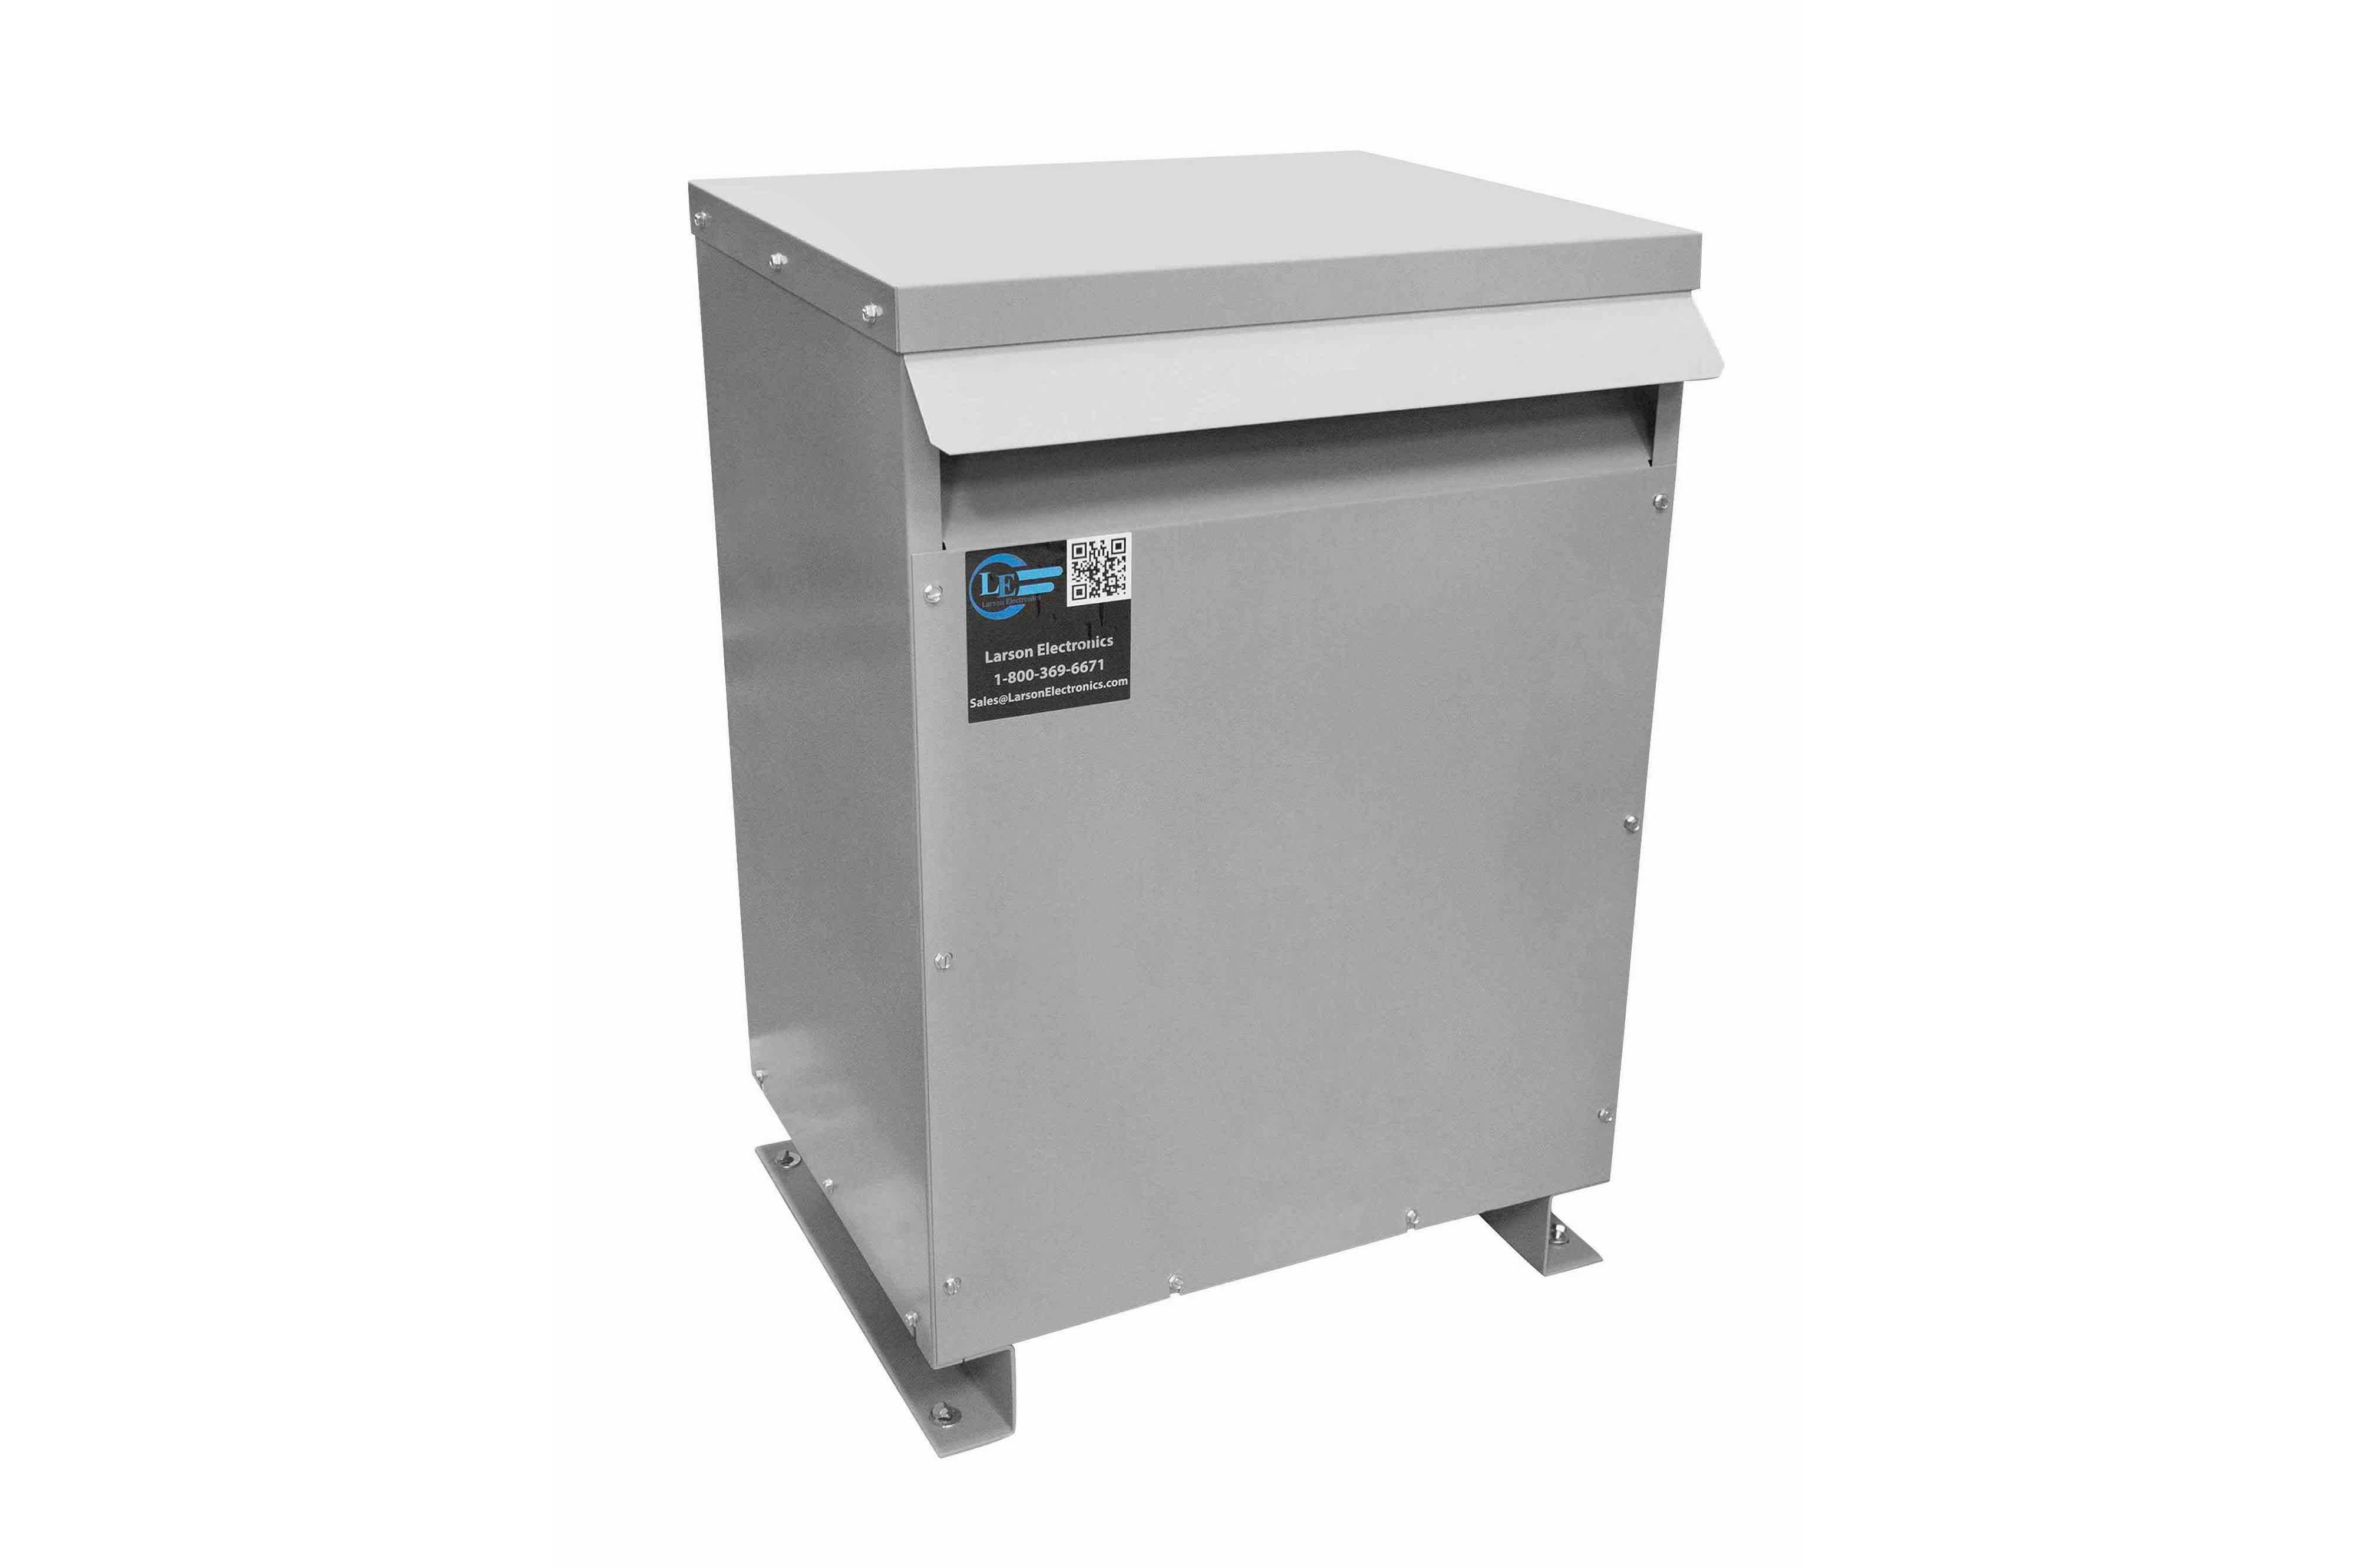 20 kVA 3PH Isolation Transformer, 440V Wye Primary, 208V Delta Secondary, N3R, Ventilated, 60 Hz